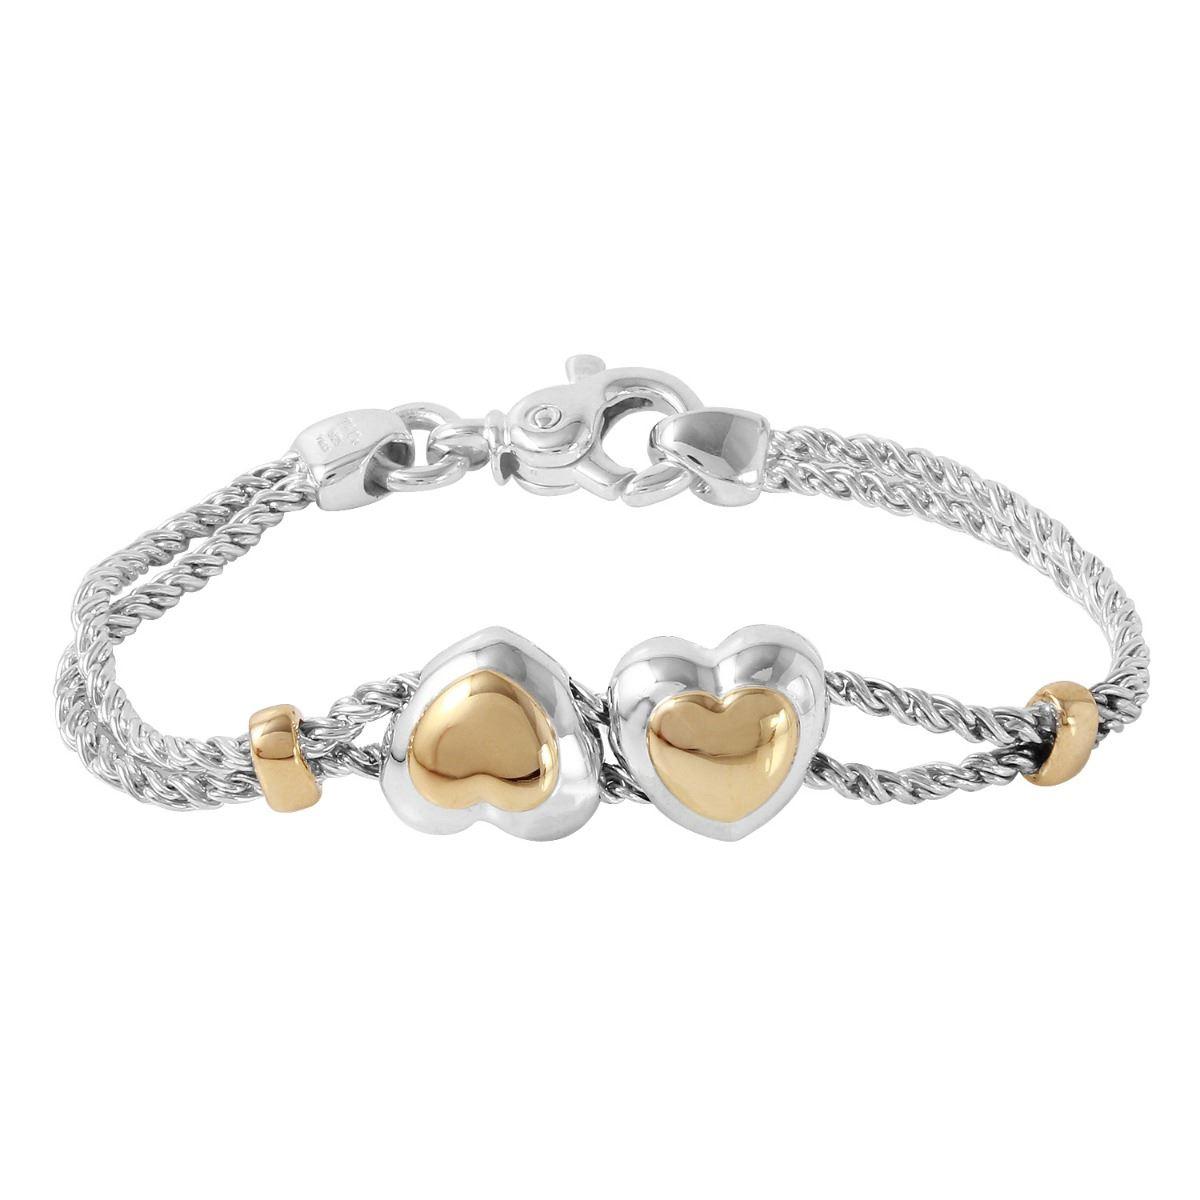 82a30fcb0 Image 1 : Tiffany & Co 18KT & Sterling Double Rope Heart Bracelet - # ...